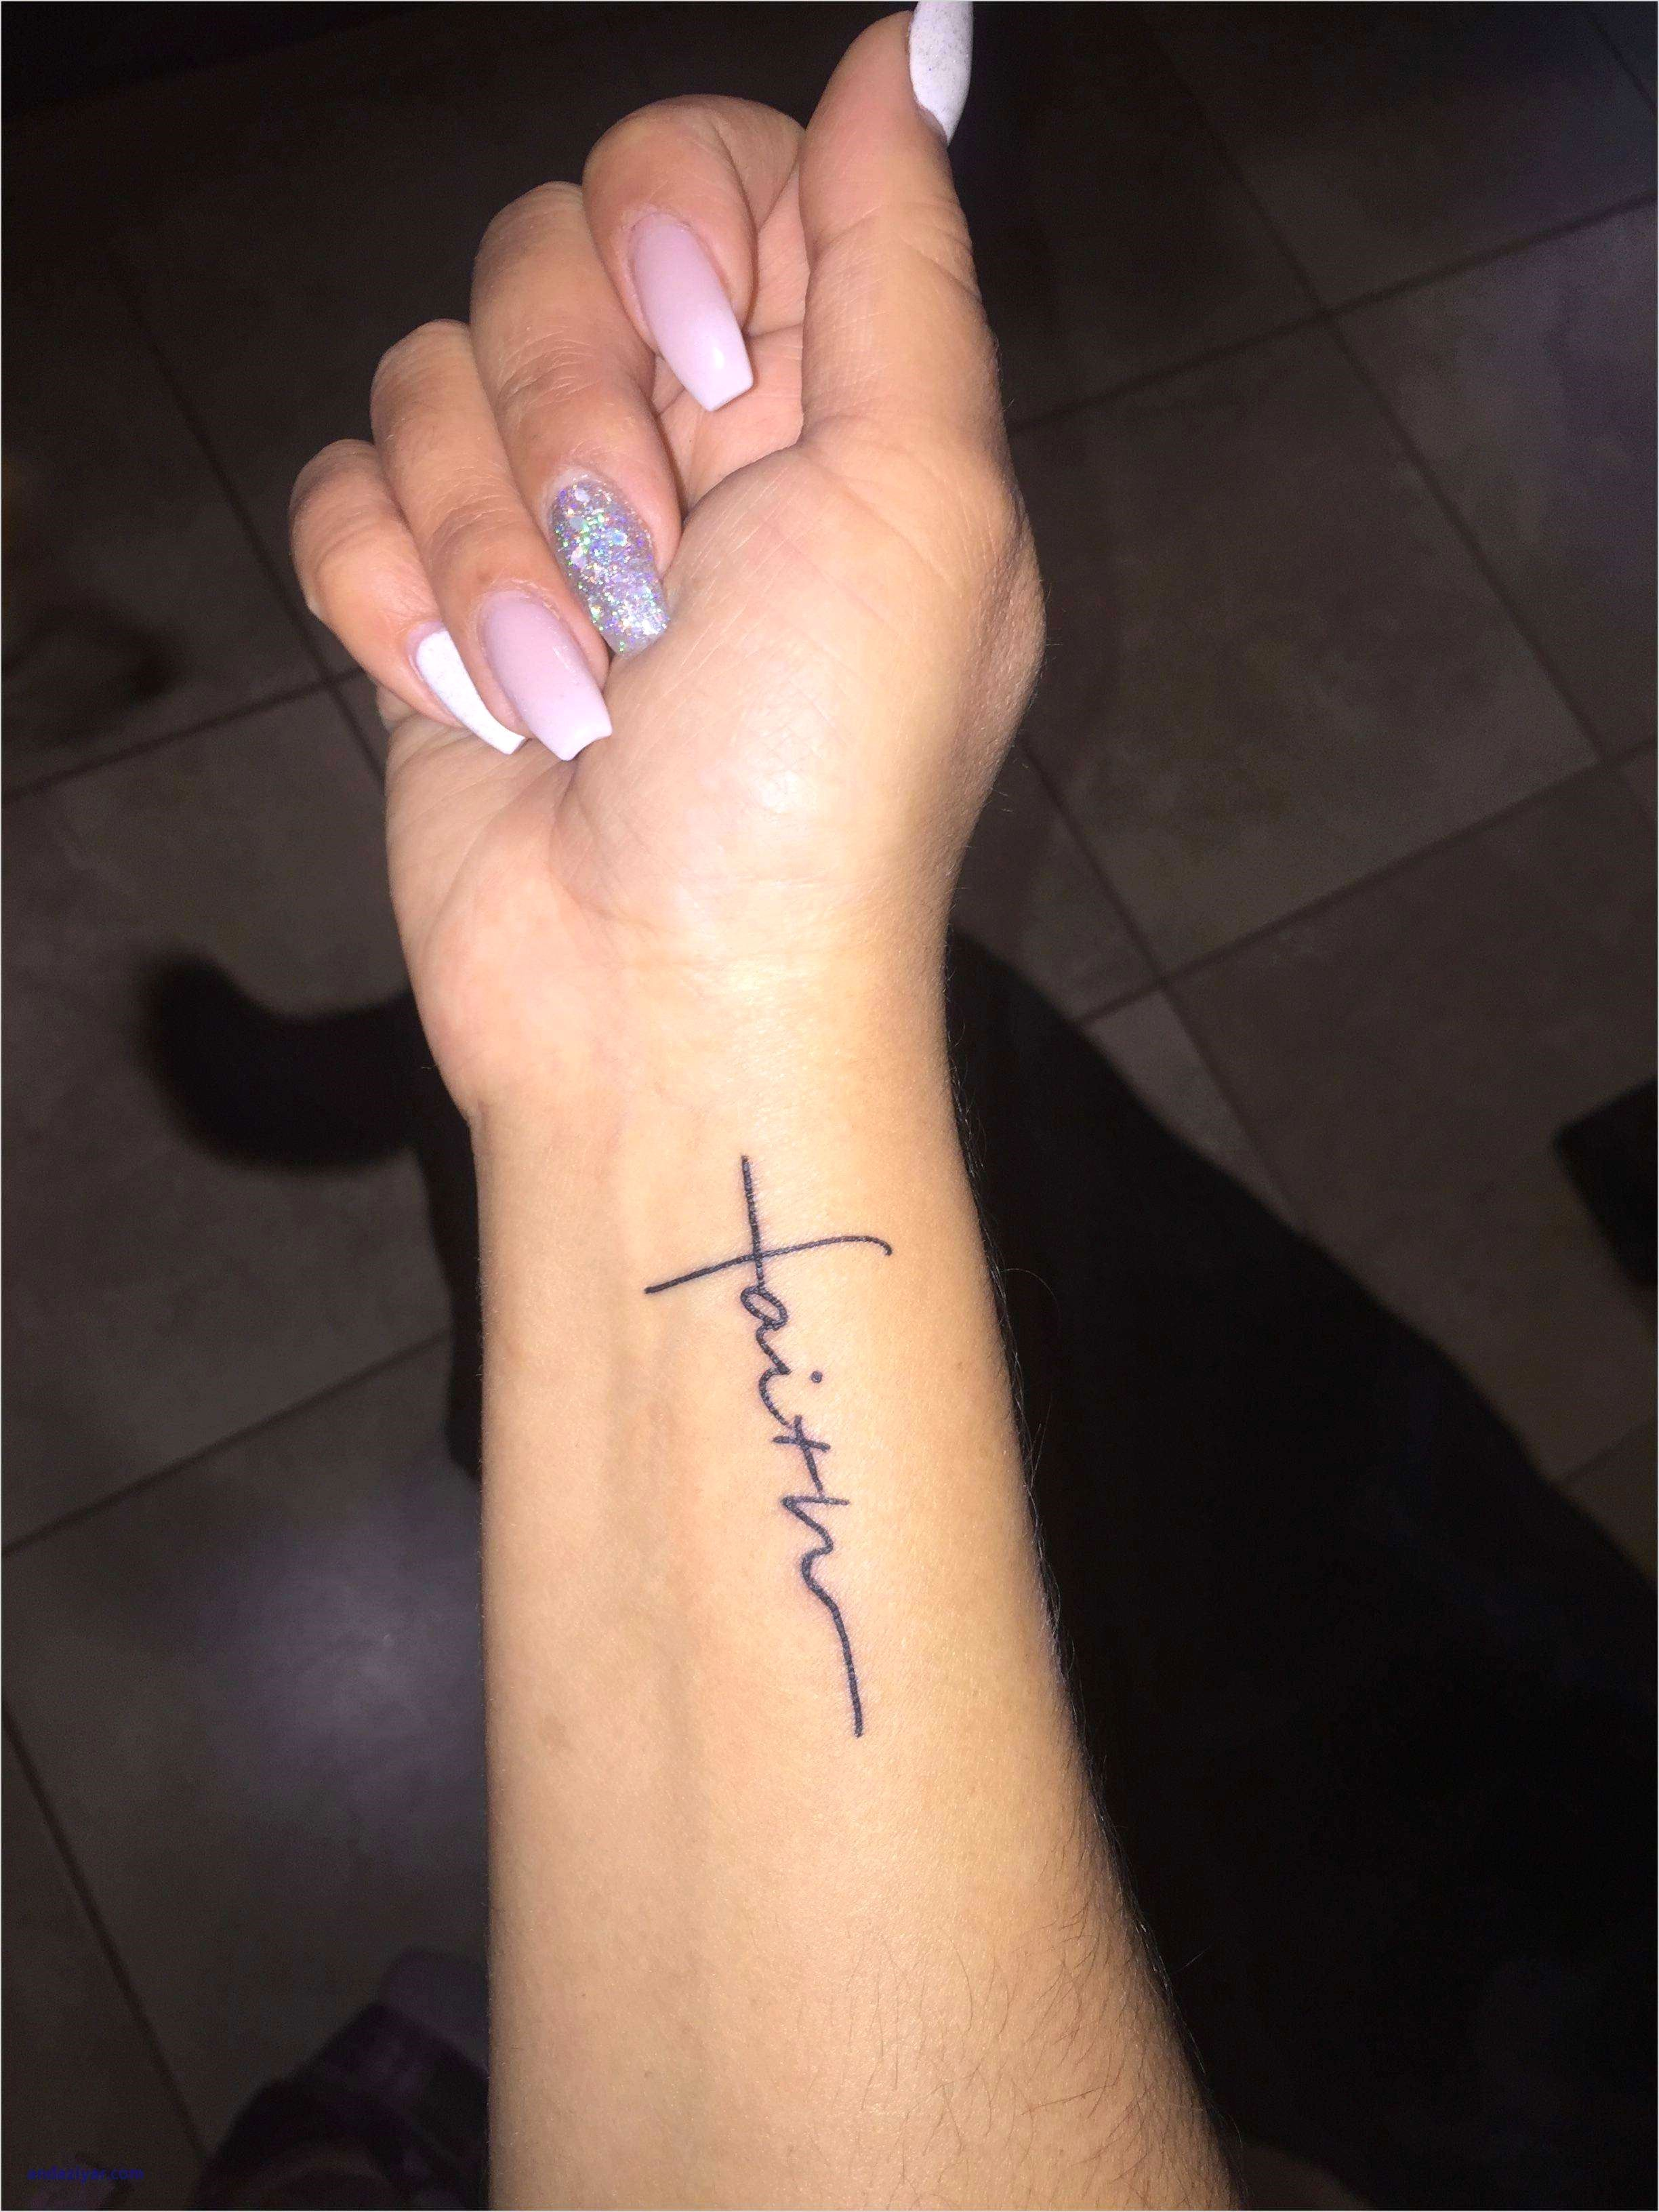 Side Wrist Name Tattoos : wrist, tattoos, Wrist, Tattoos, Trick, Trendy, Tattoos,, Women,, Women, Small